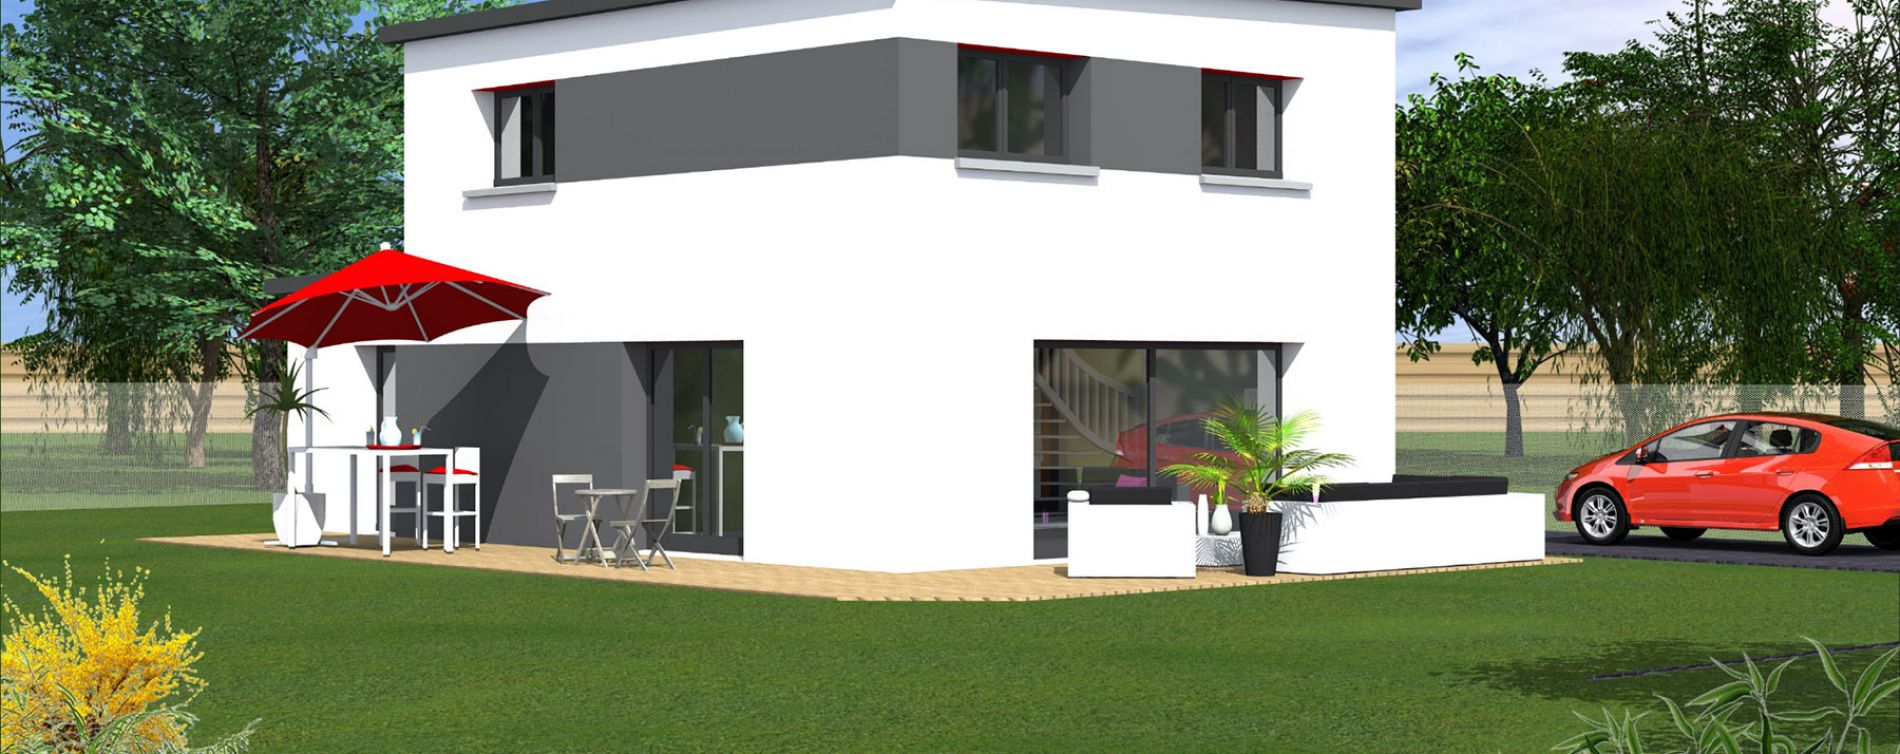 Landivisiau : programme immobilier neuve « Canik Ar Haro » (2)